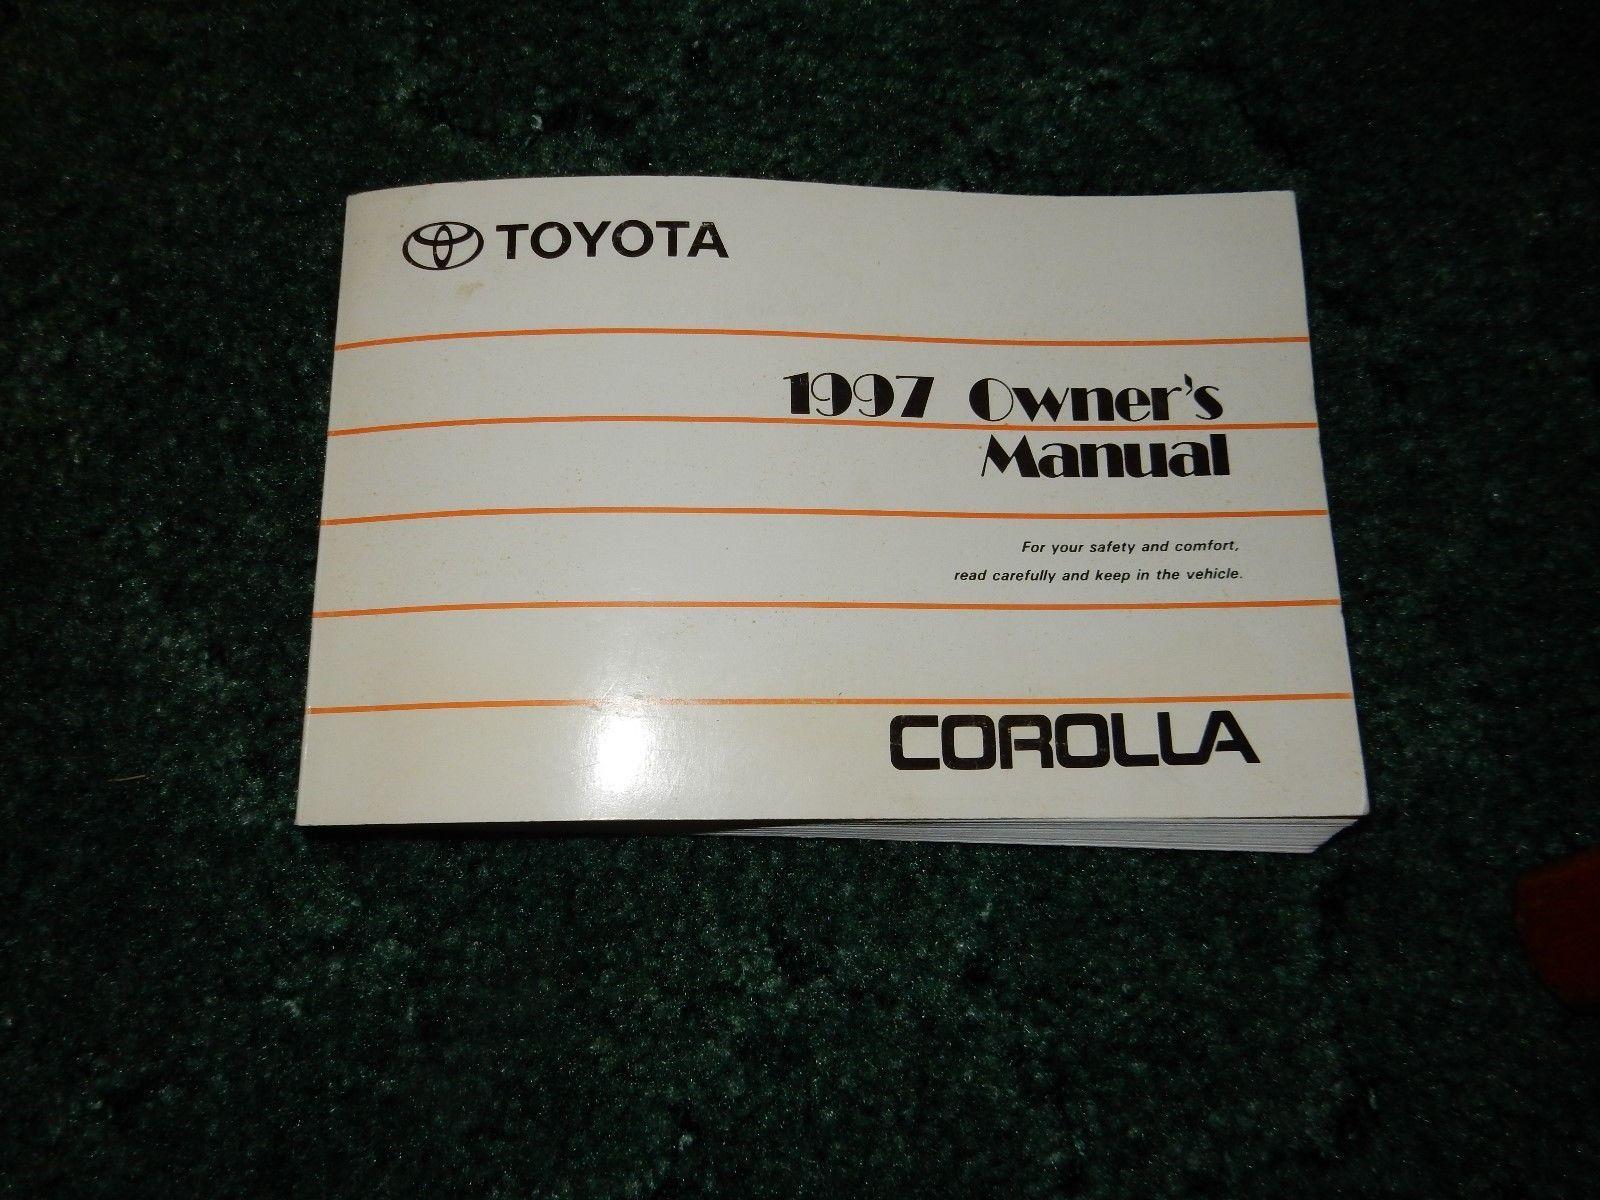 1997 Toyota Corolla Factory Original Owners Manual Part # 011999-12671